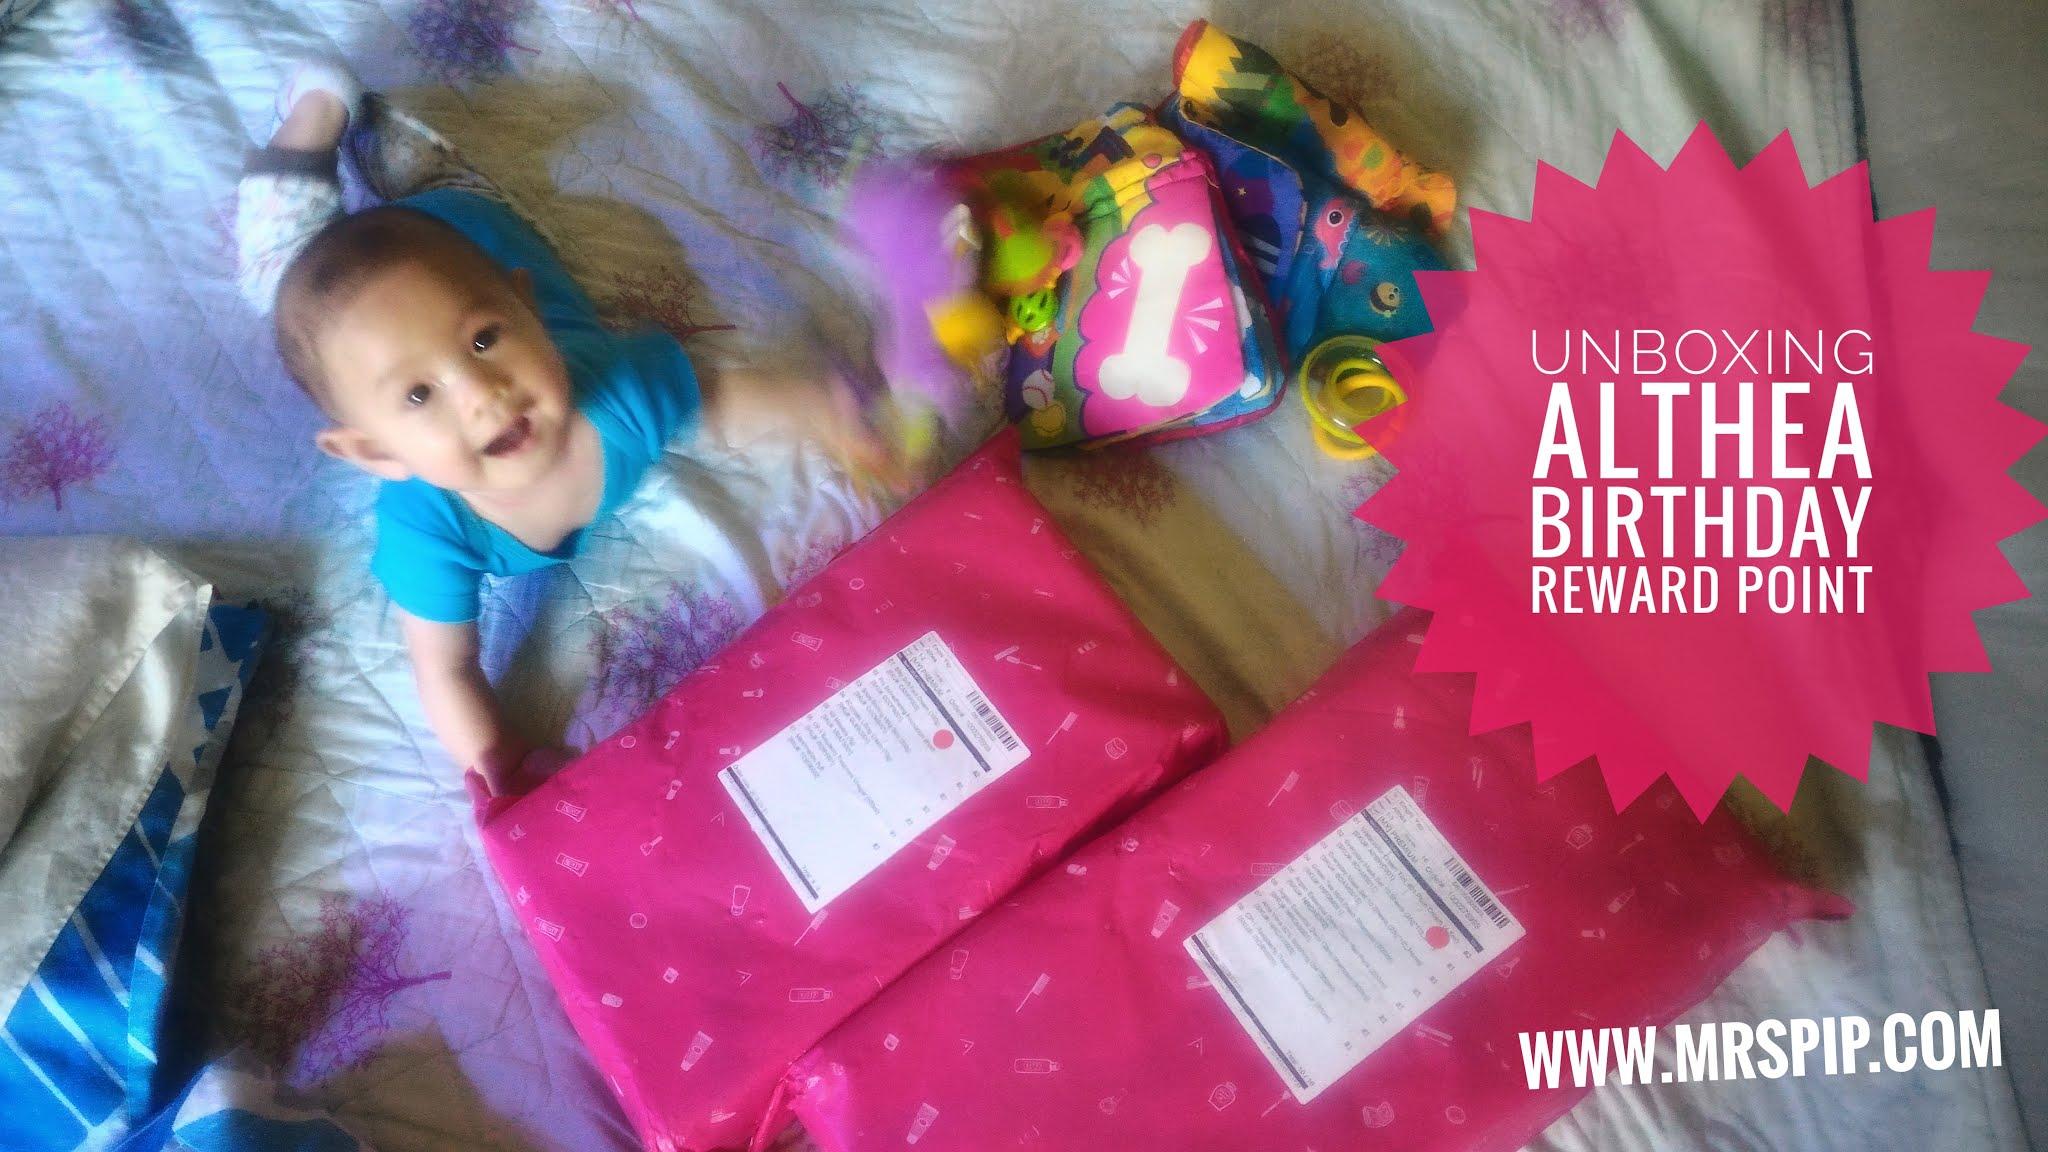 Unboxing Althea Birthday Reward Point